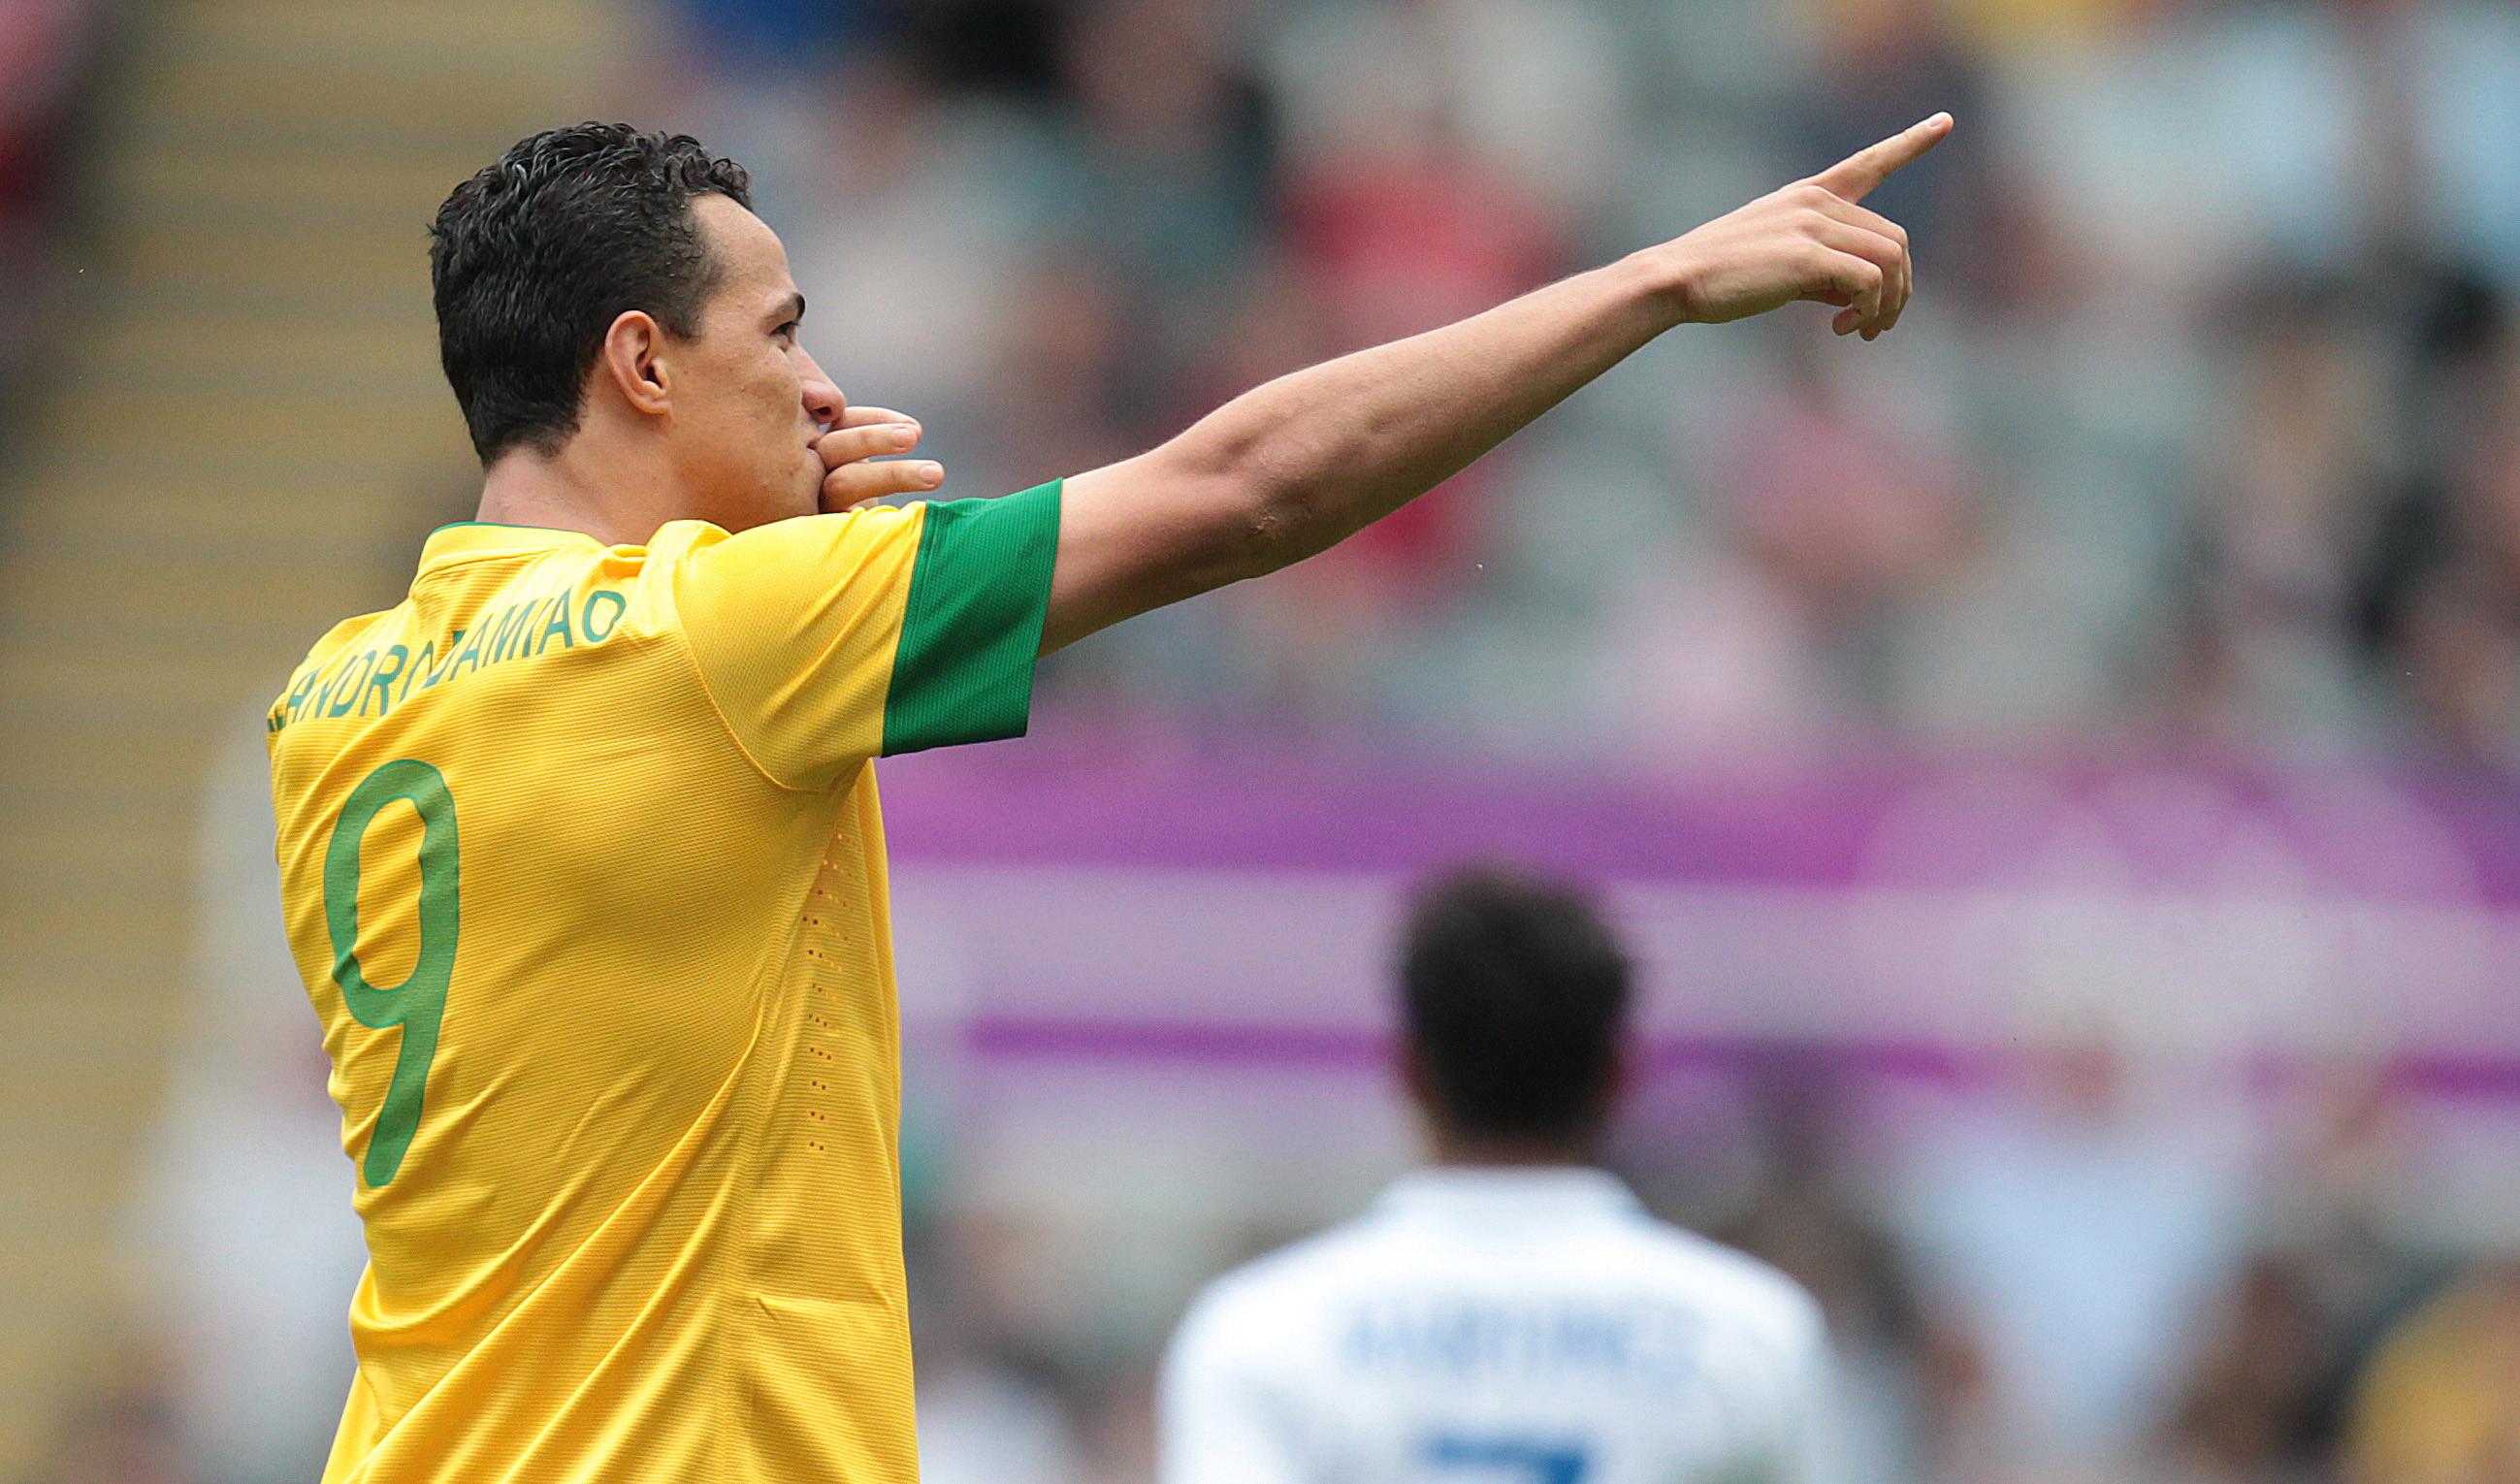 Rafael Ribeiro / CBF